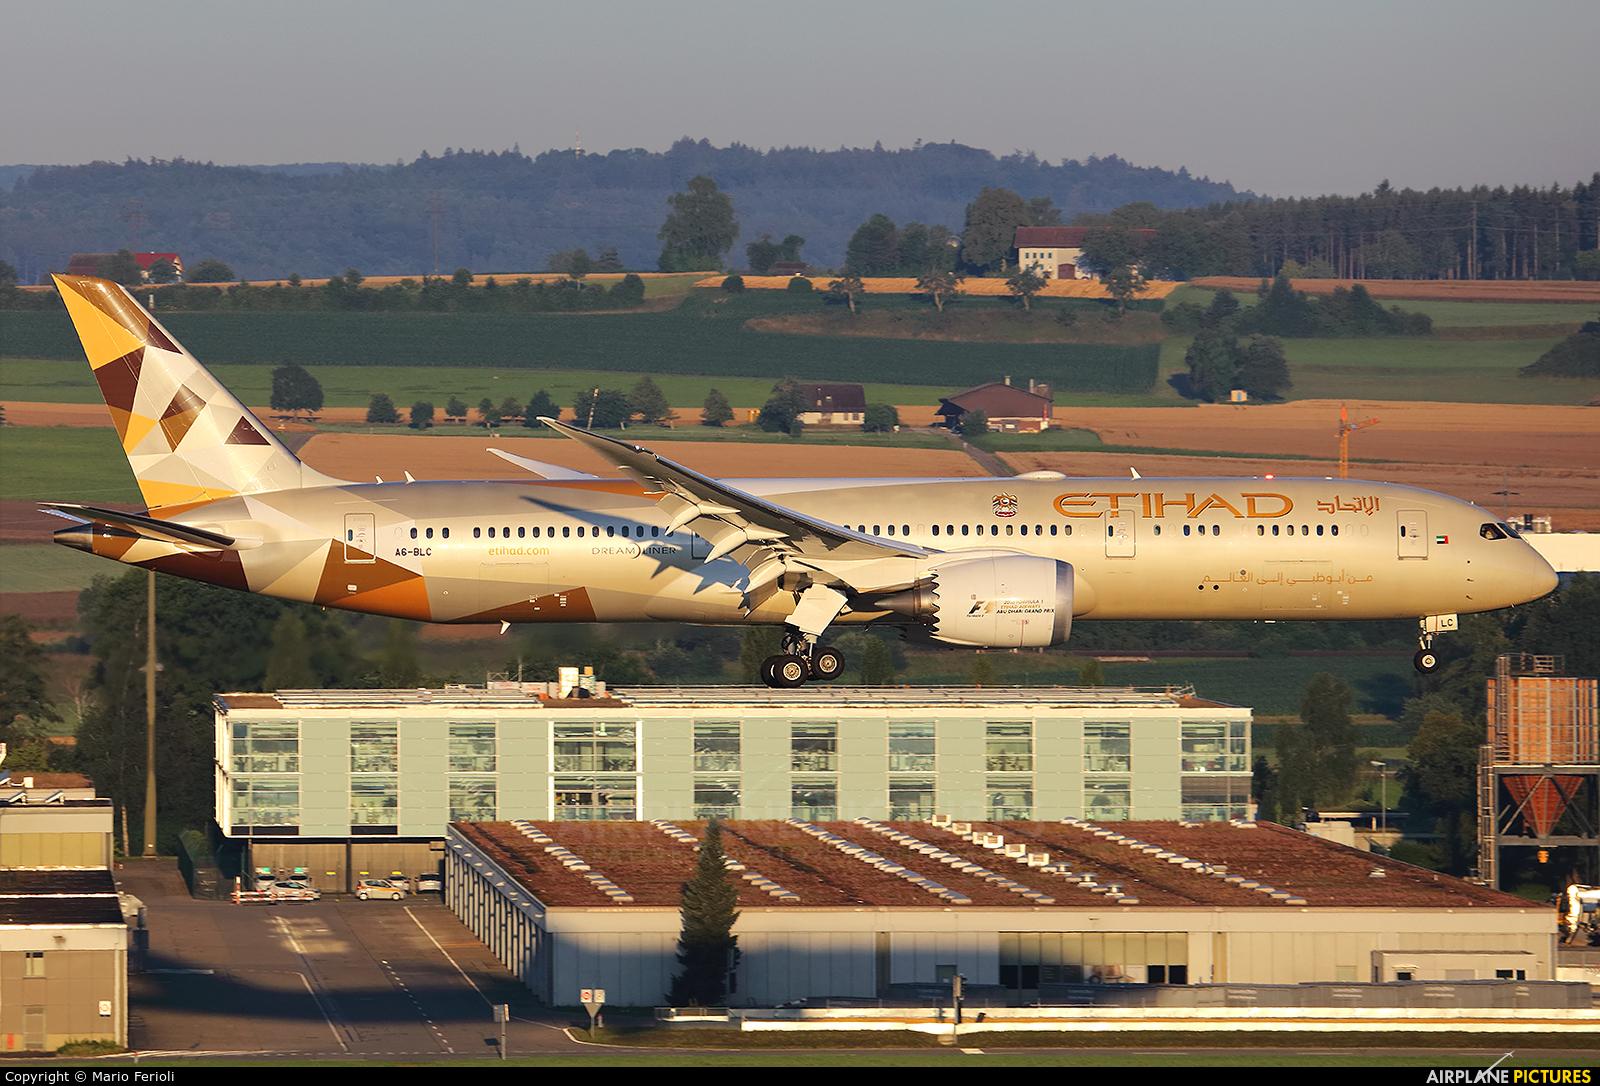 Etihad Airways A6-BLC aircraft at Zurich